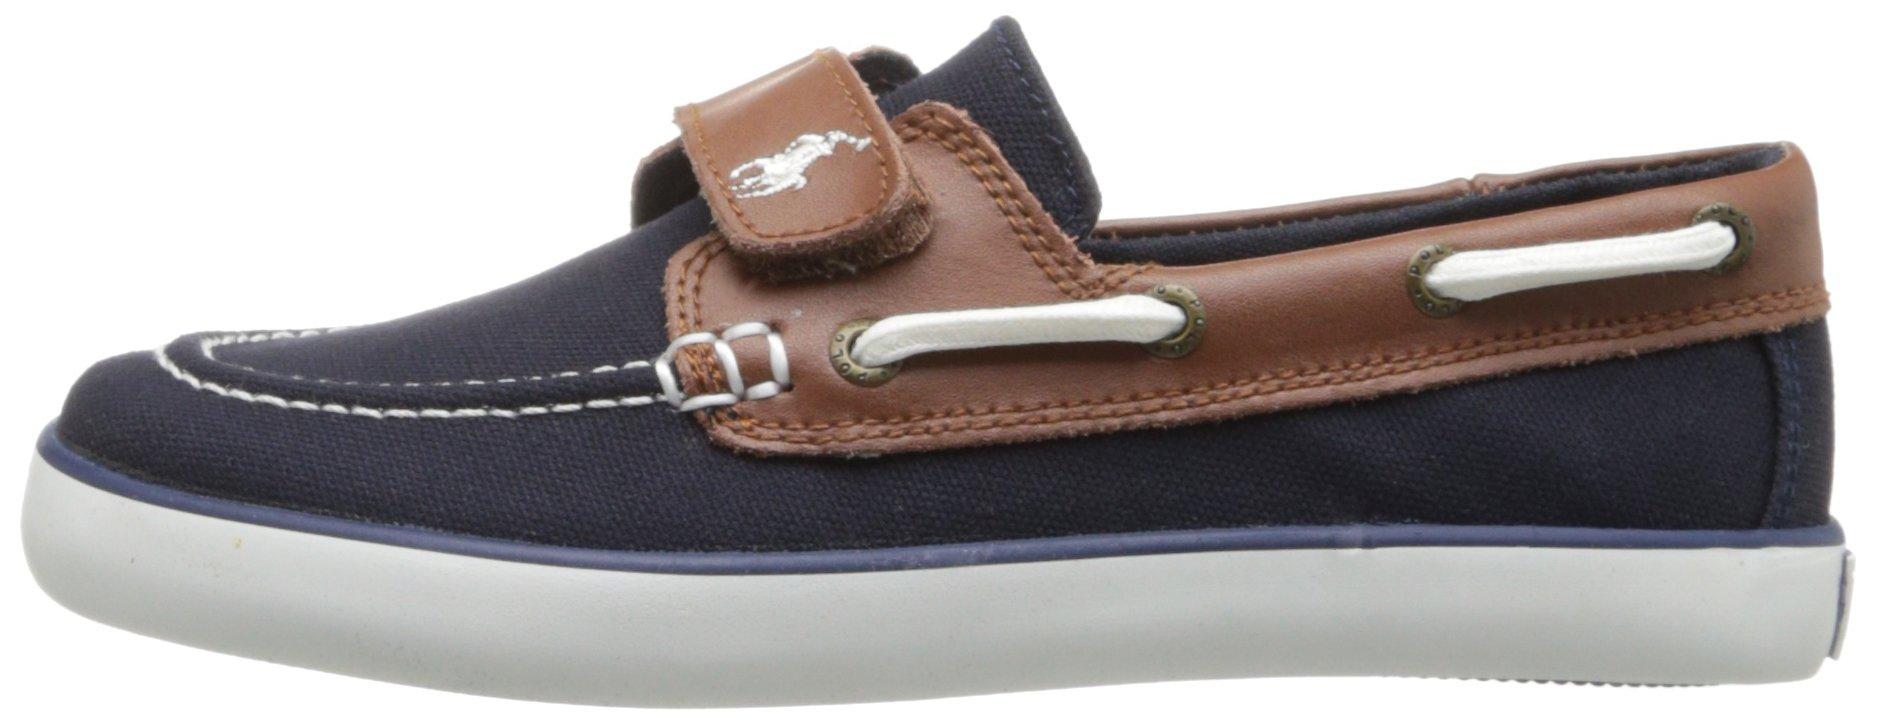 Polo Ralph Lauren Kids Sander-CL EZ Sneaker ,Navy,10.5 M US Little Kid by Polo Ralph Lauren (Image #5)